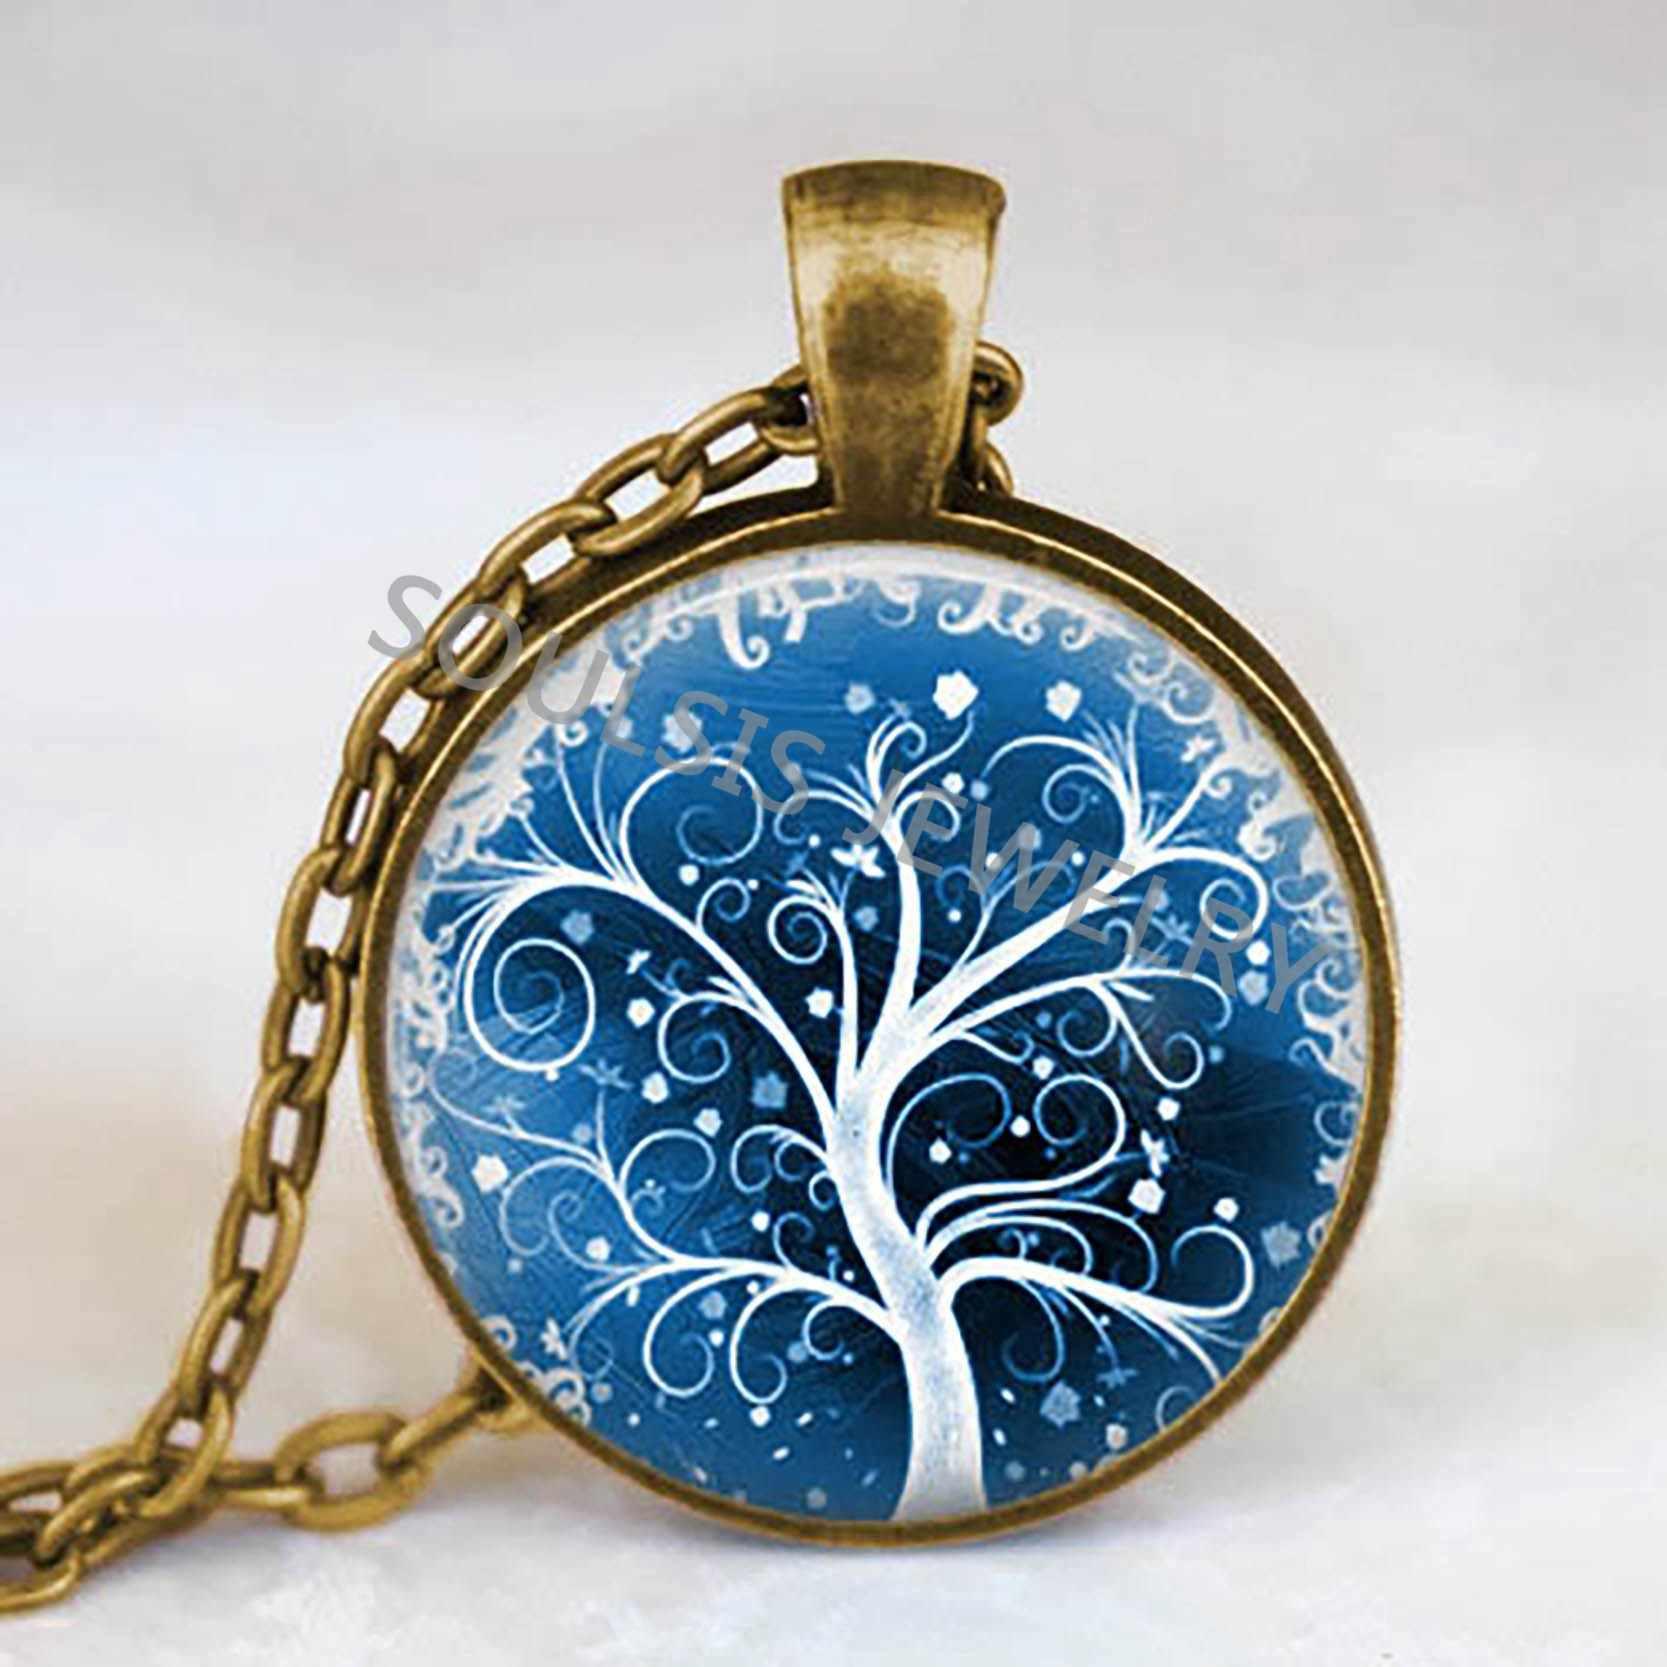 Life Tree จี้สร้อยคอแก้ว Cabochon สร้อยคอ Long Chain Vintage Choker สร้อยคอผู้หญิงเครื่องประดับ